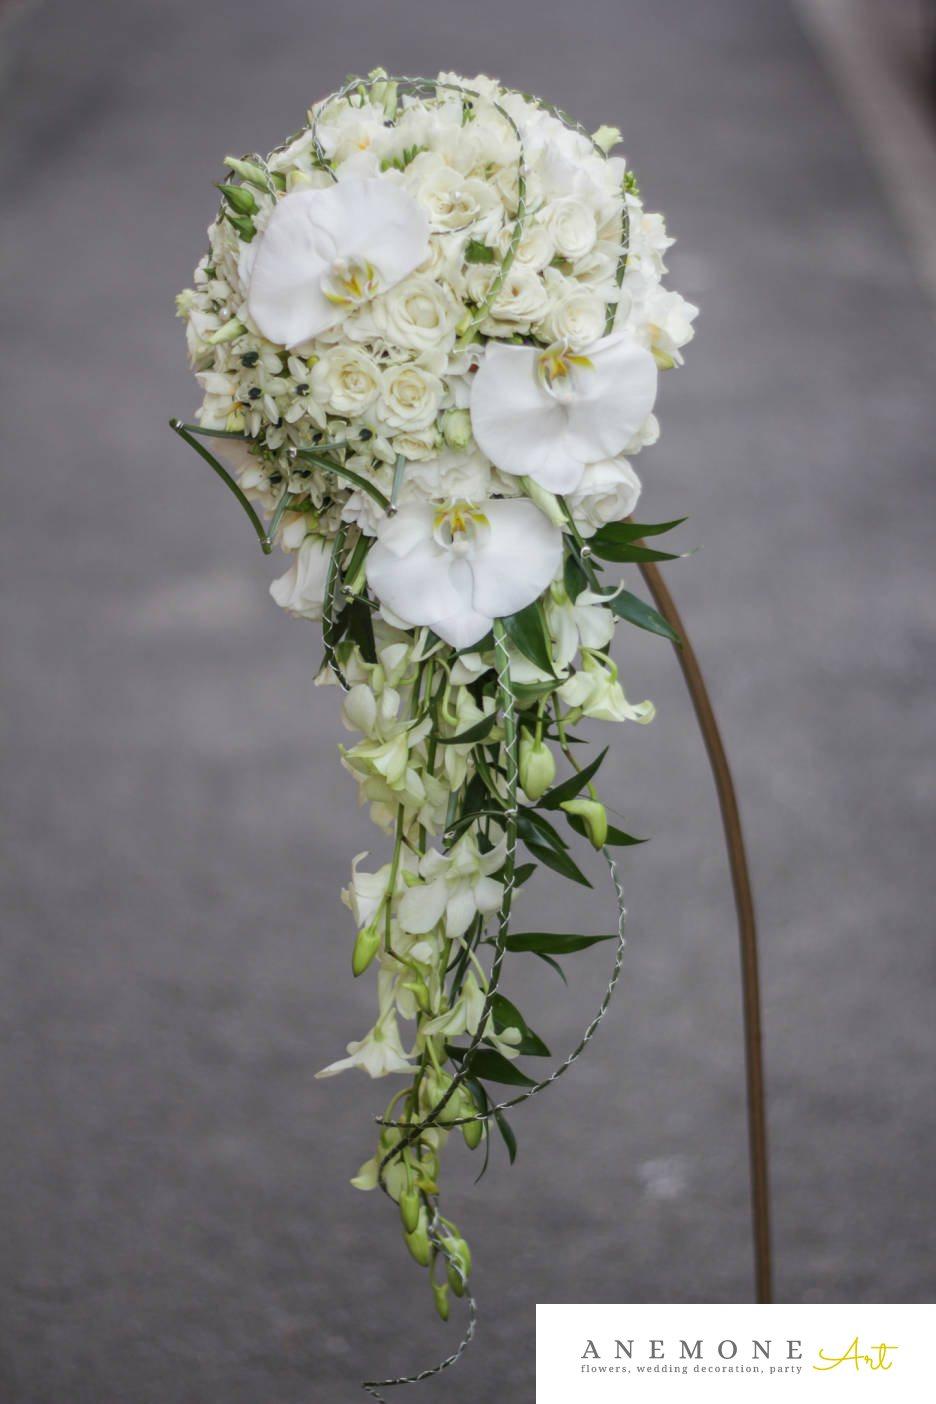 Poza, foto cu Flori de nunta alb, buchet mireasa, curgator, lisianthus, mini-rosa, orhidee, ornitogallum, trandafiri in Arad, Timisoara, Oradea (wedding flowers, bouquets) nunta Arad, Timisoara, Oradea